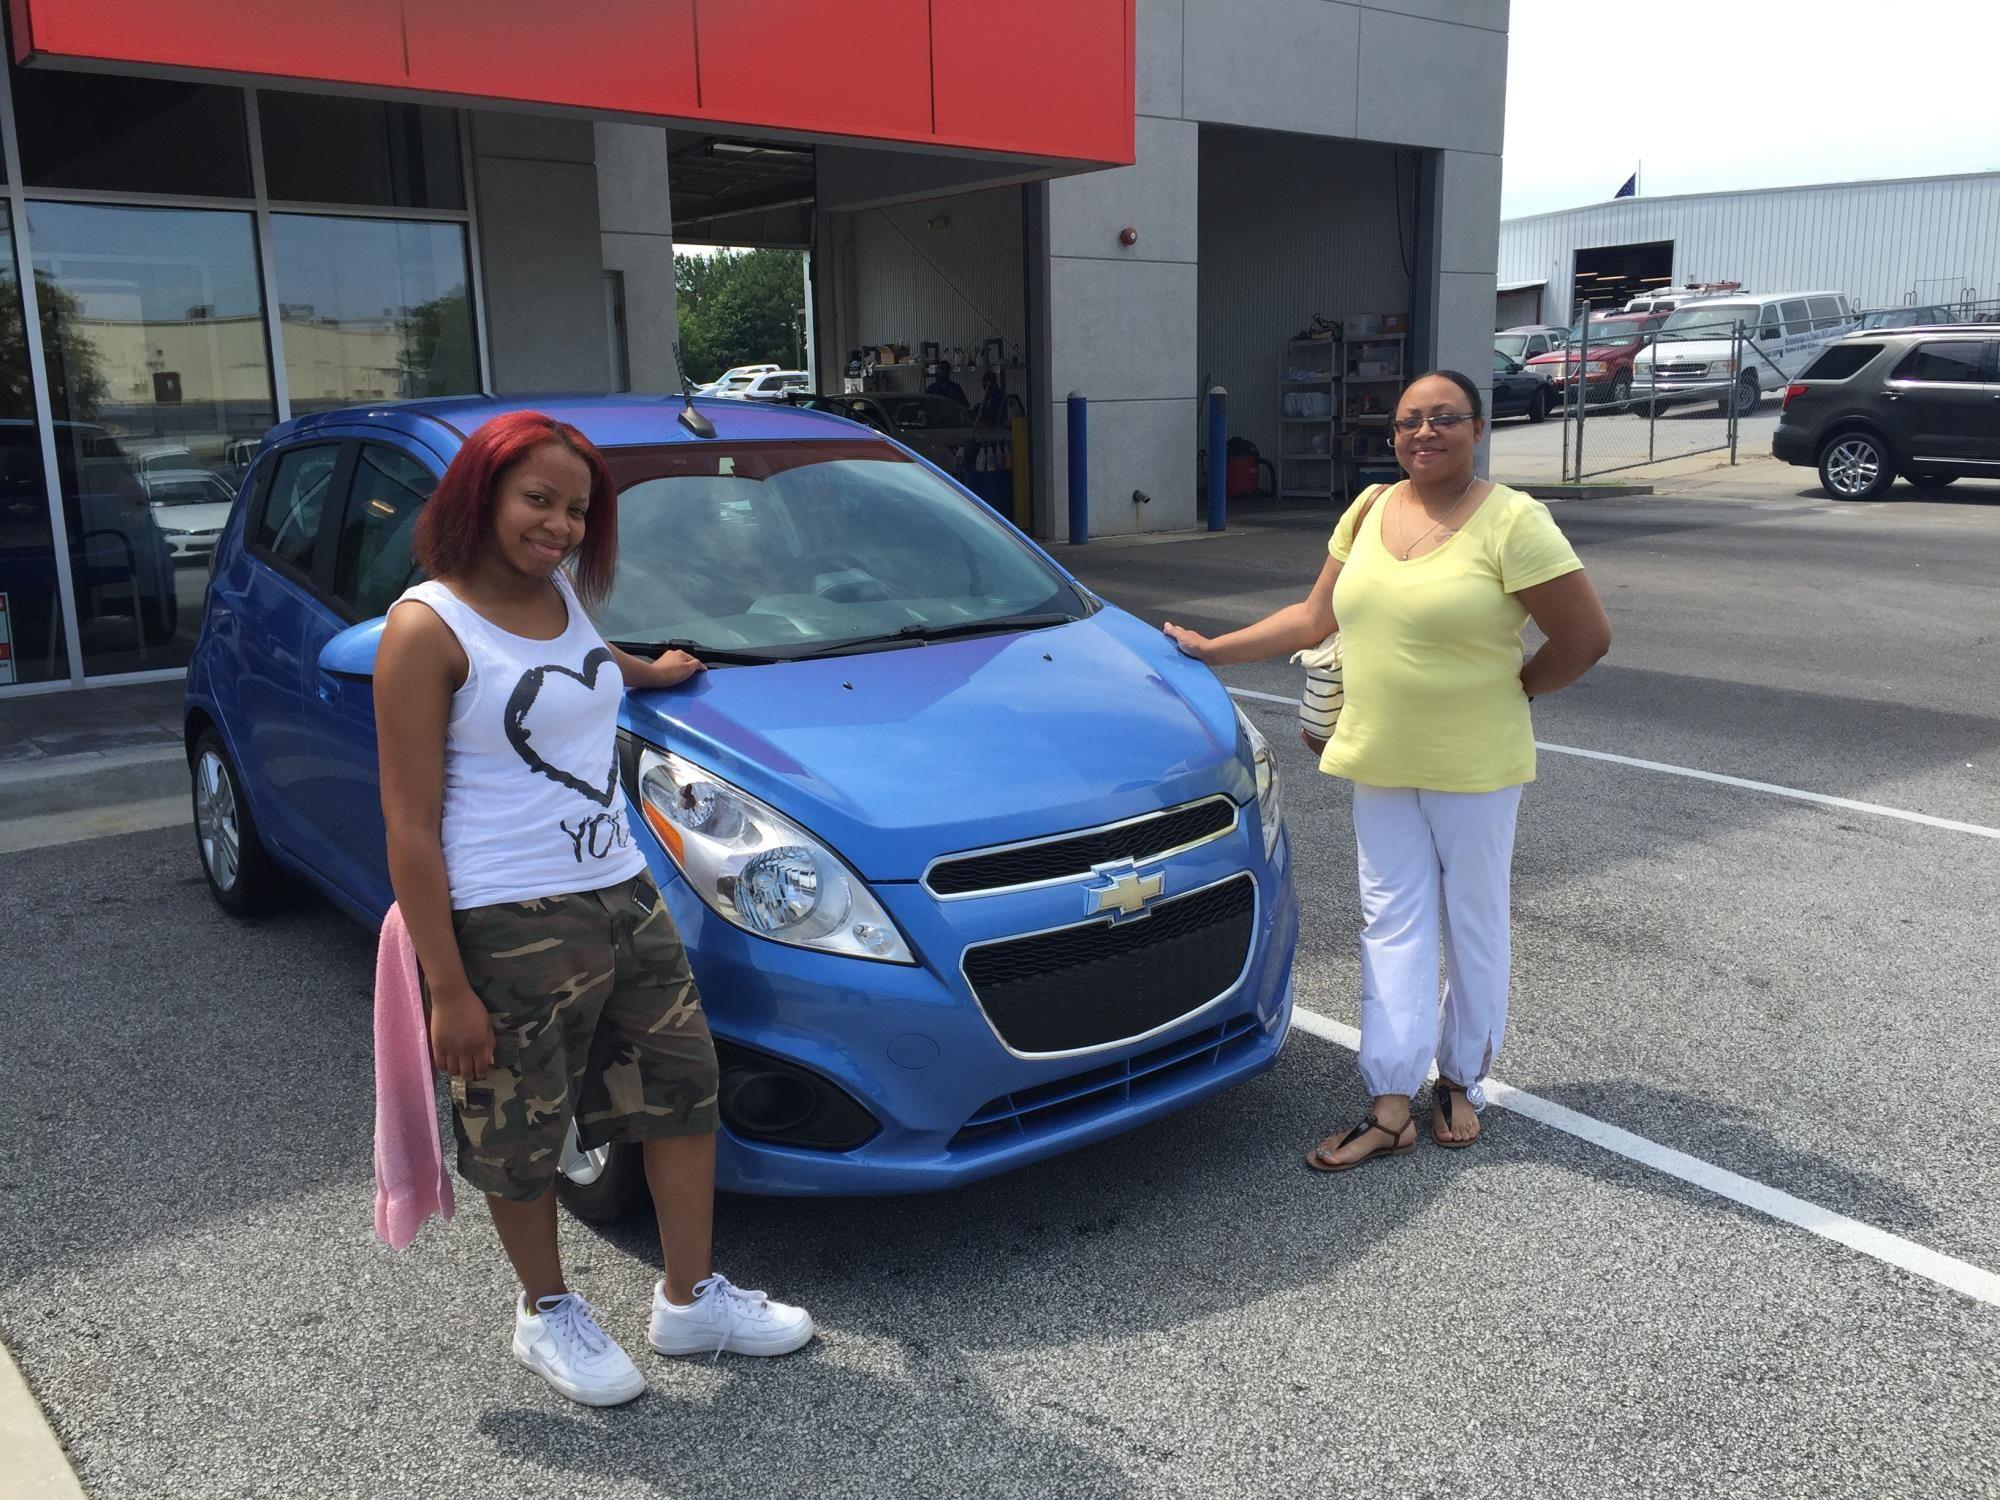 Shaunterria White reviews the 2014 Chevrolet Spark she purchased